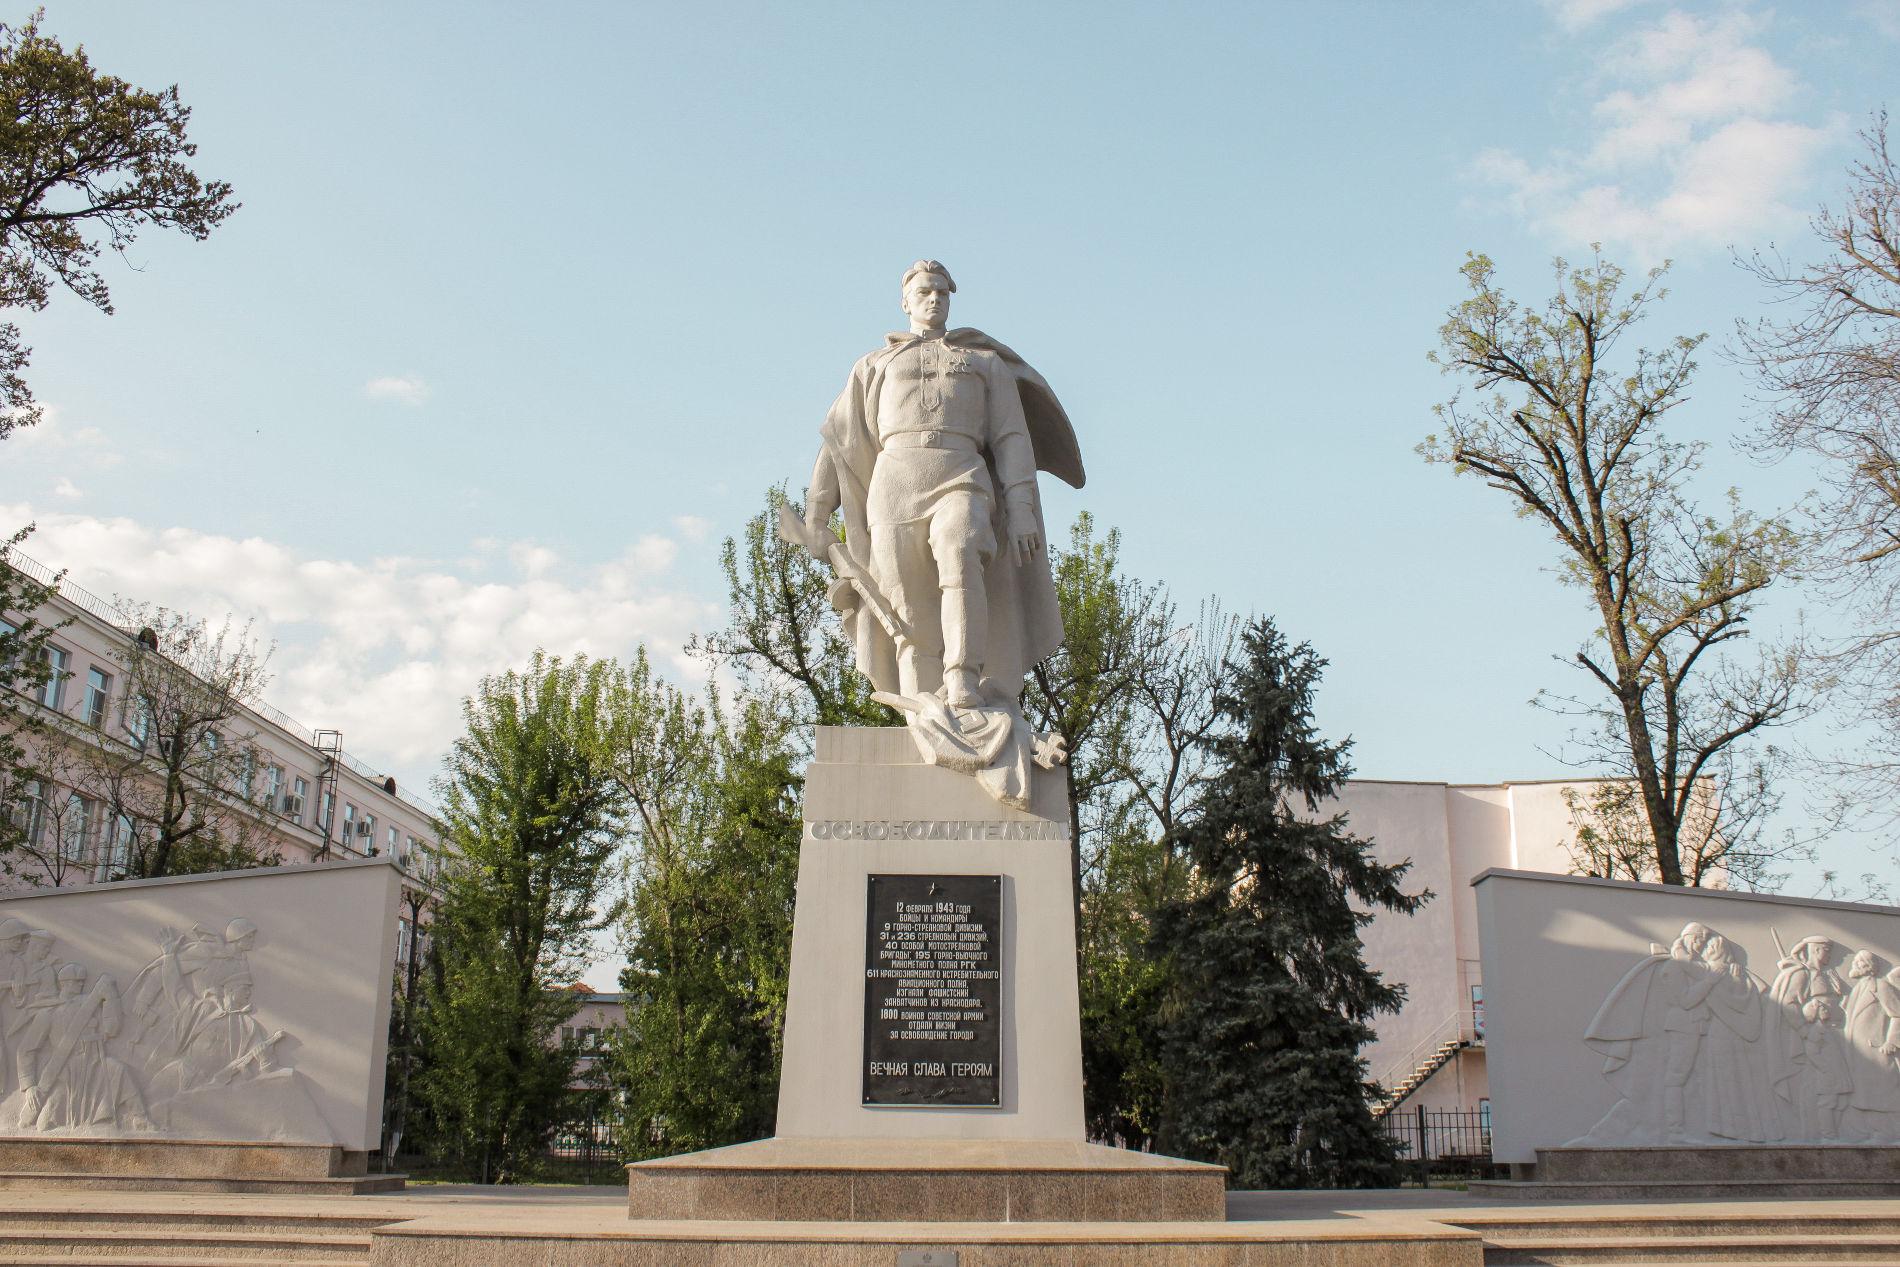 Скульптура «Воин-освободитель» ©Фото Динара Бурангулова, Юга.ру